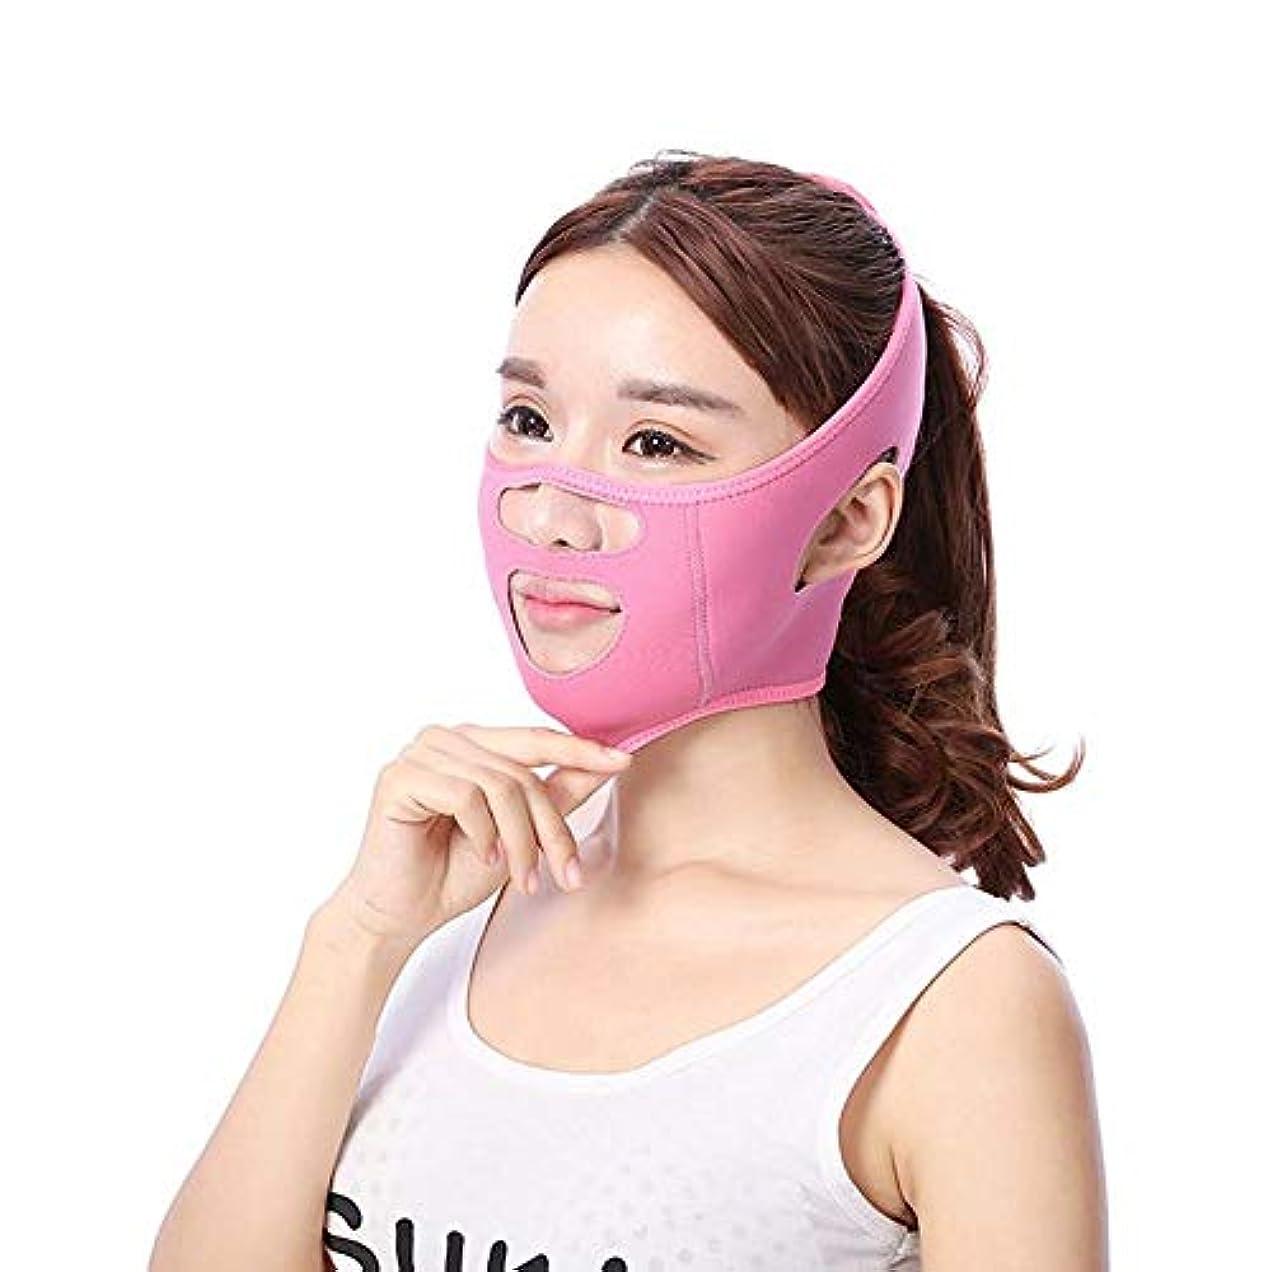 Jia Jia- シンフェイスアーティファクトリフティング引き締めフェイス睡眠包帯フェイシャルリフティングアンチ垂れ下がり法律パターンステッカー8ワード口角 - ピンク 顔面包帯